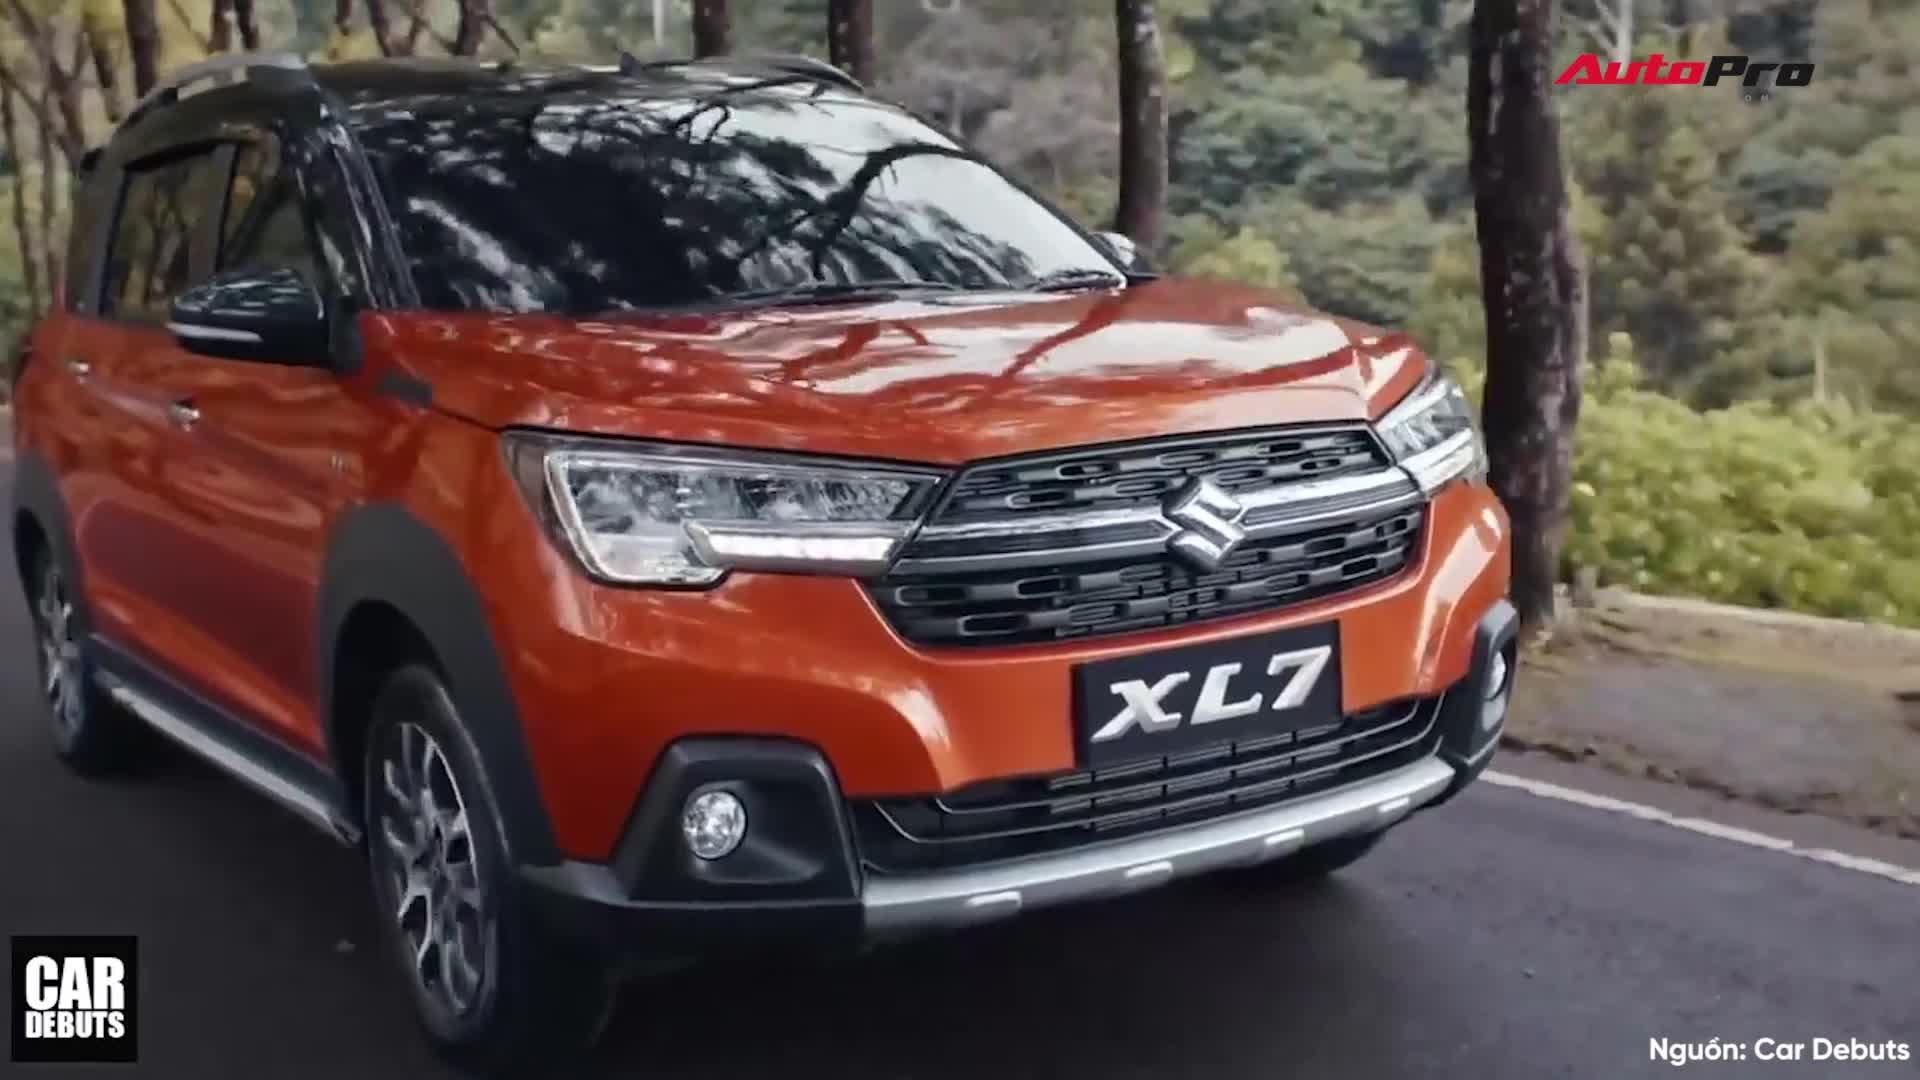 Khám phá chi tiết Suzuki XL7